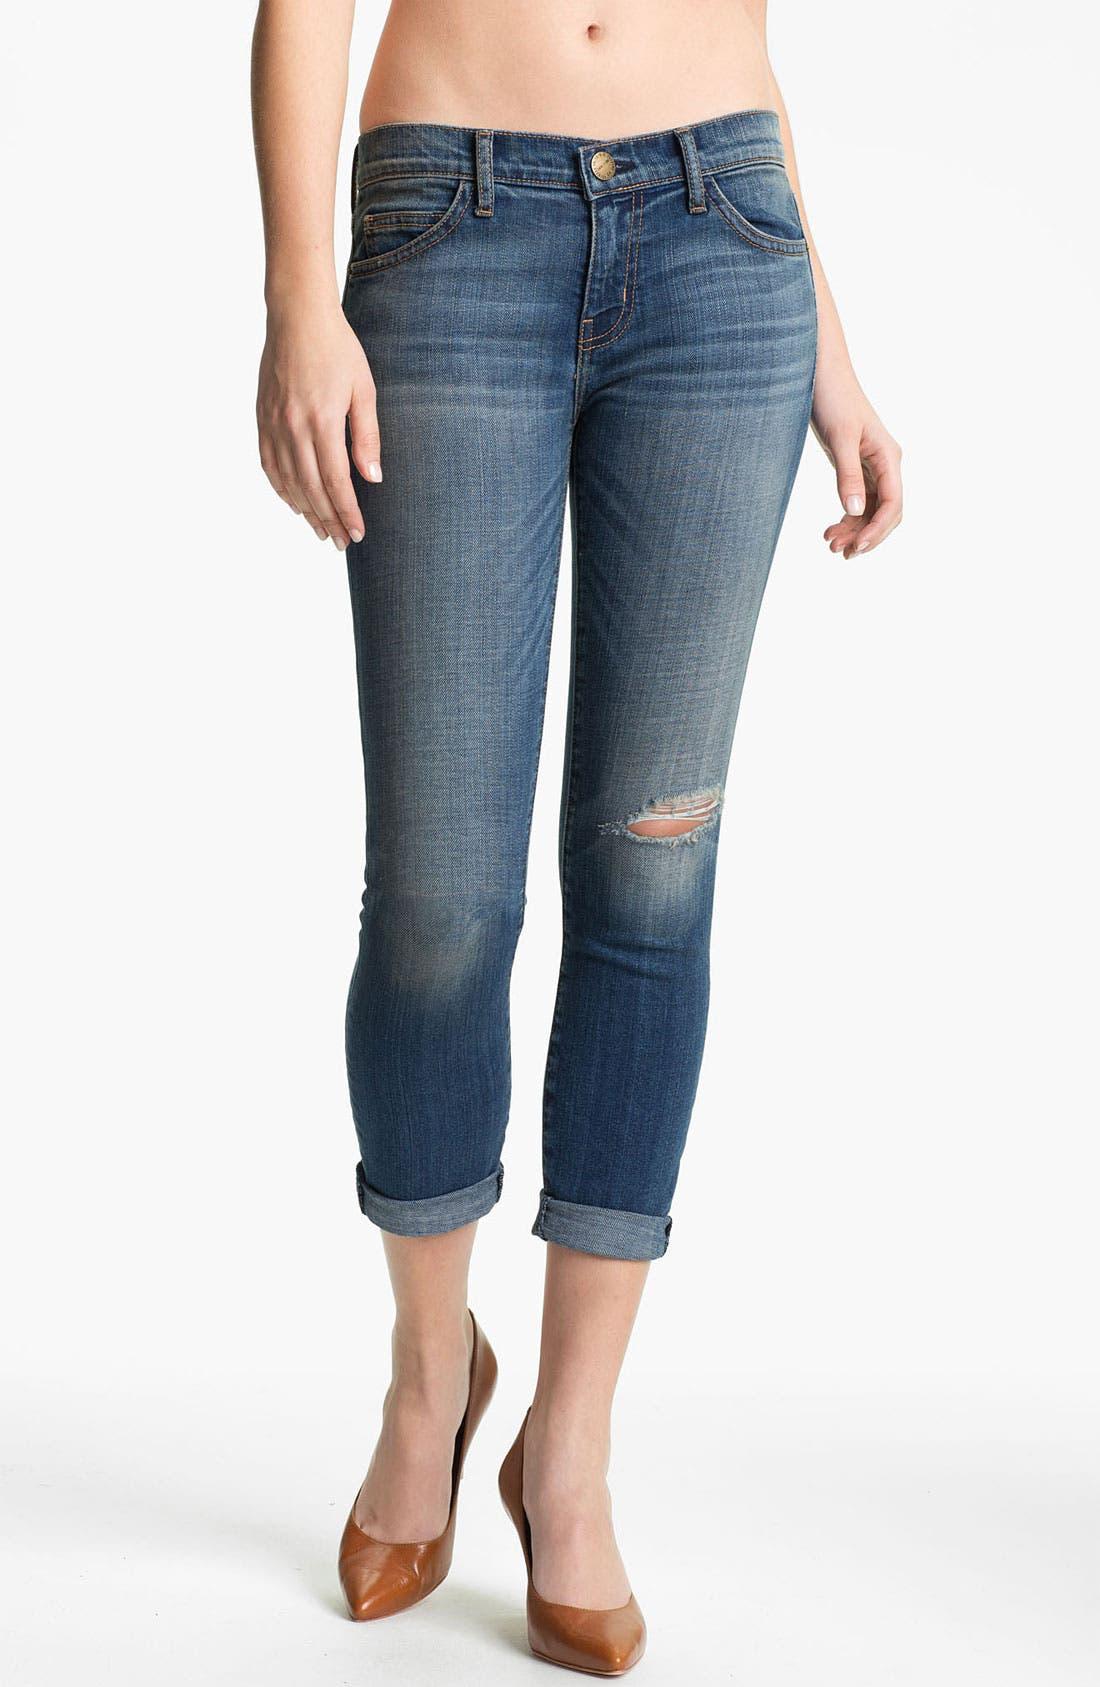 Main Image - Current/Elliott 'The Stiletto' Skinny Stretch Jeans (Juke Box/Destroy)